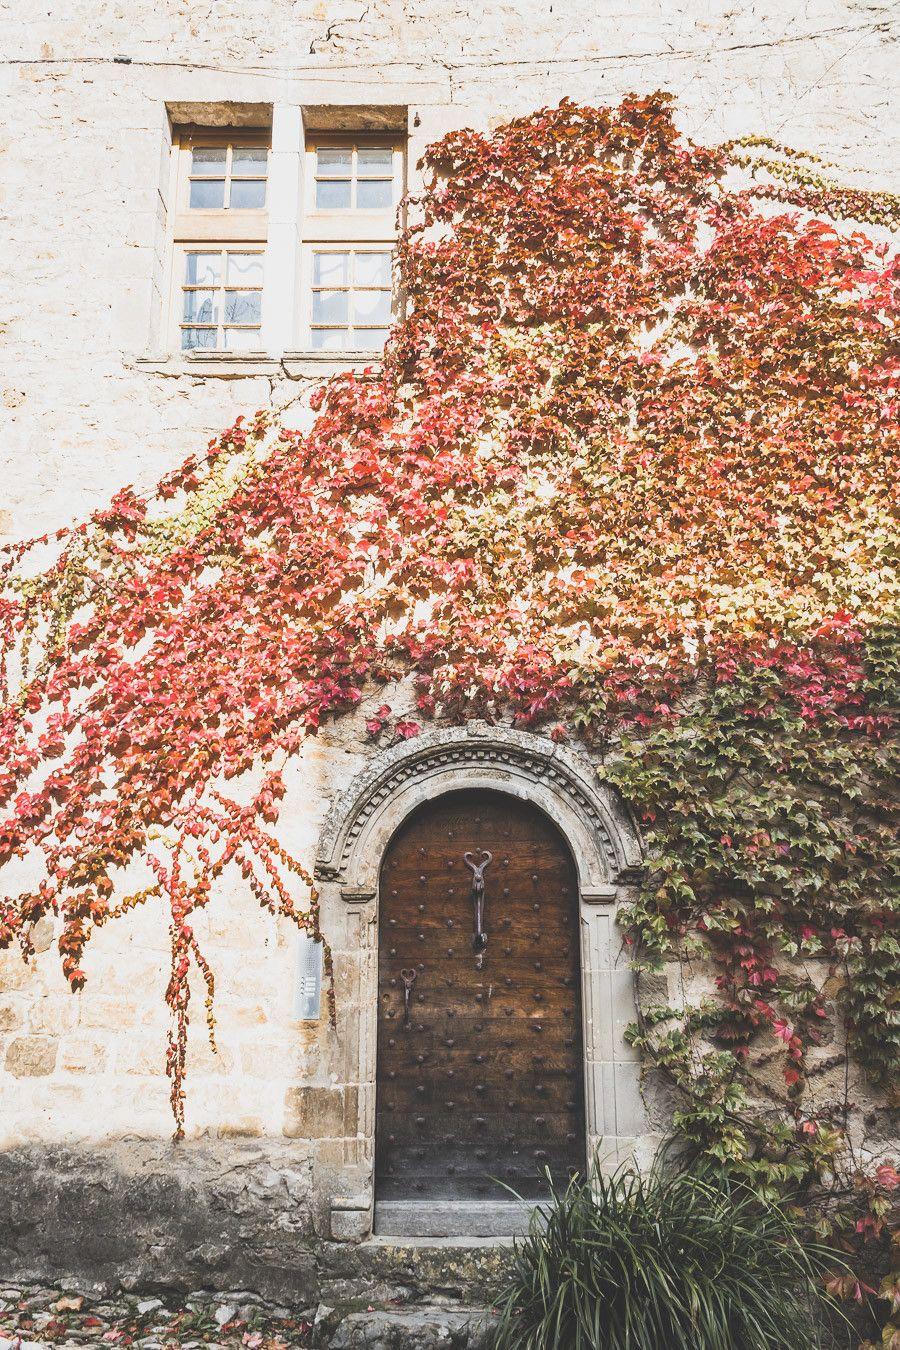 Le Tarn à l'Occitanie